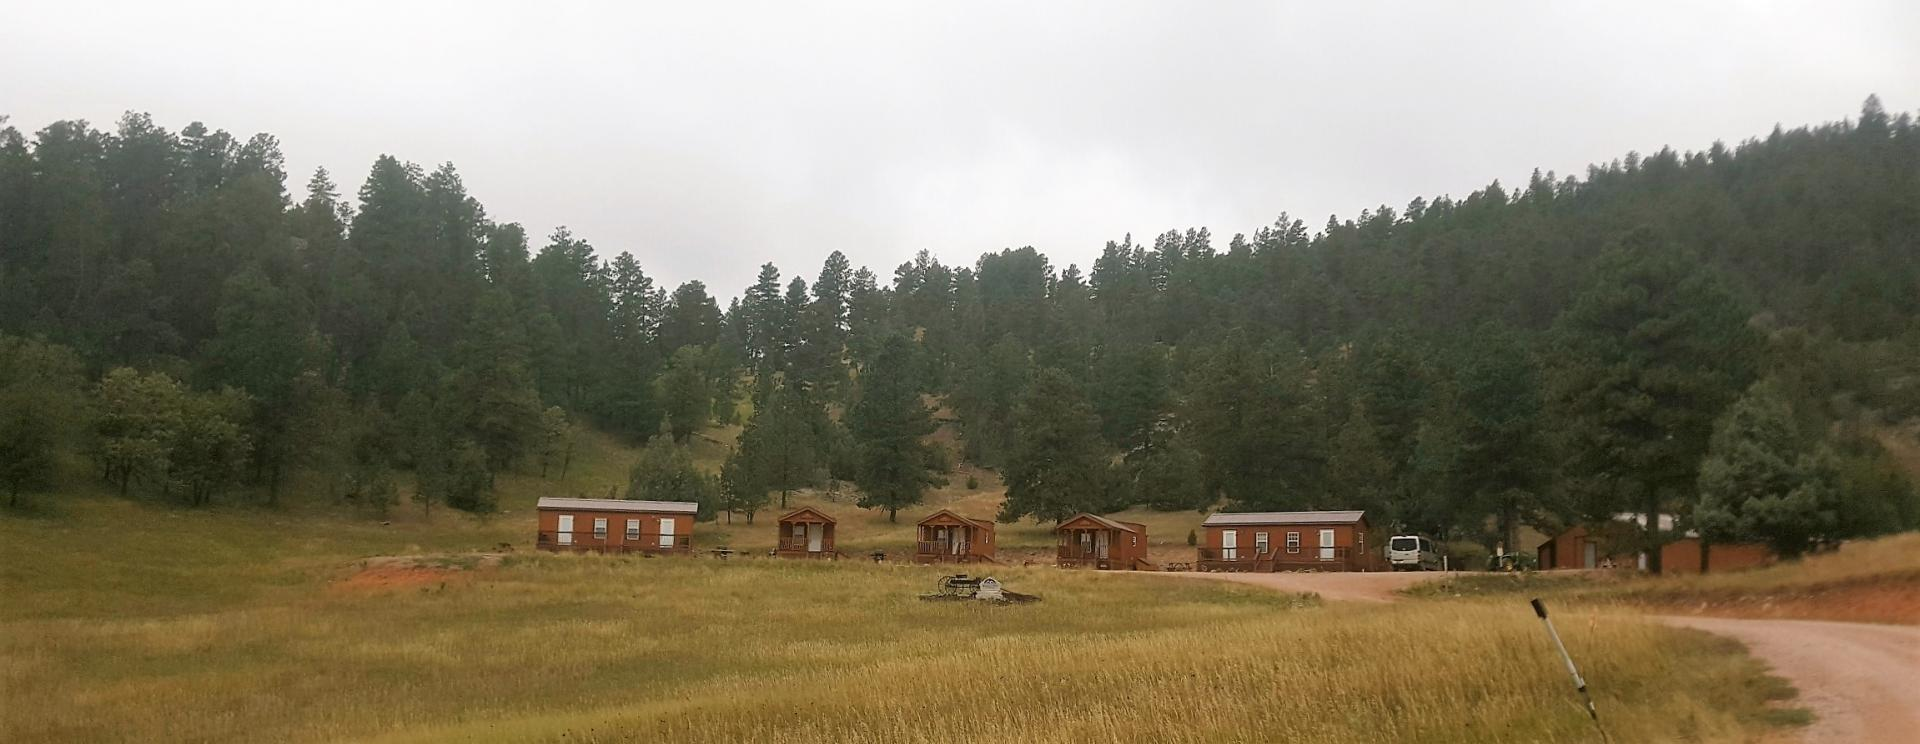 bearlodge mountain resort | black hills & badlands - south dakota